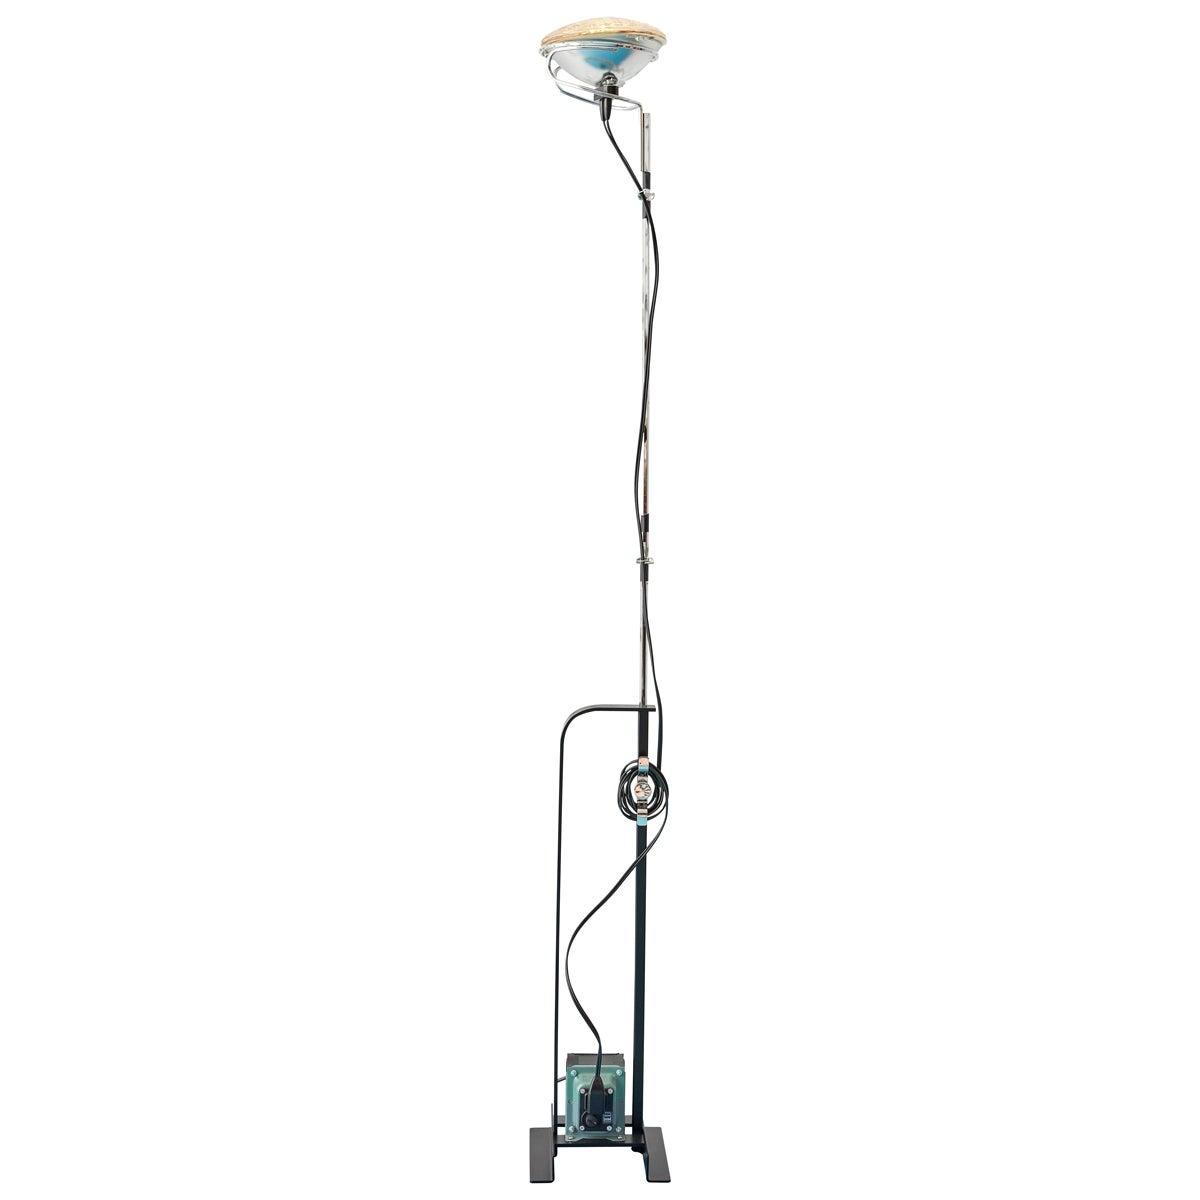 Comtemporary Flos Toio Steel Floor Lamp by Achille & Pier Giacomo Castiglioni